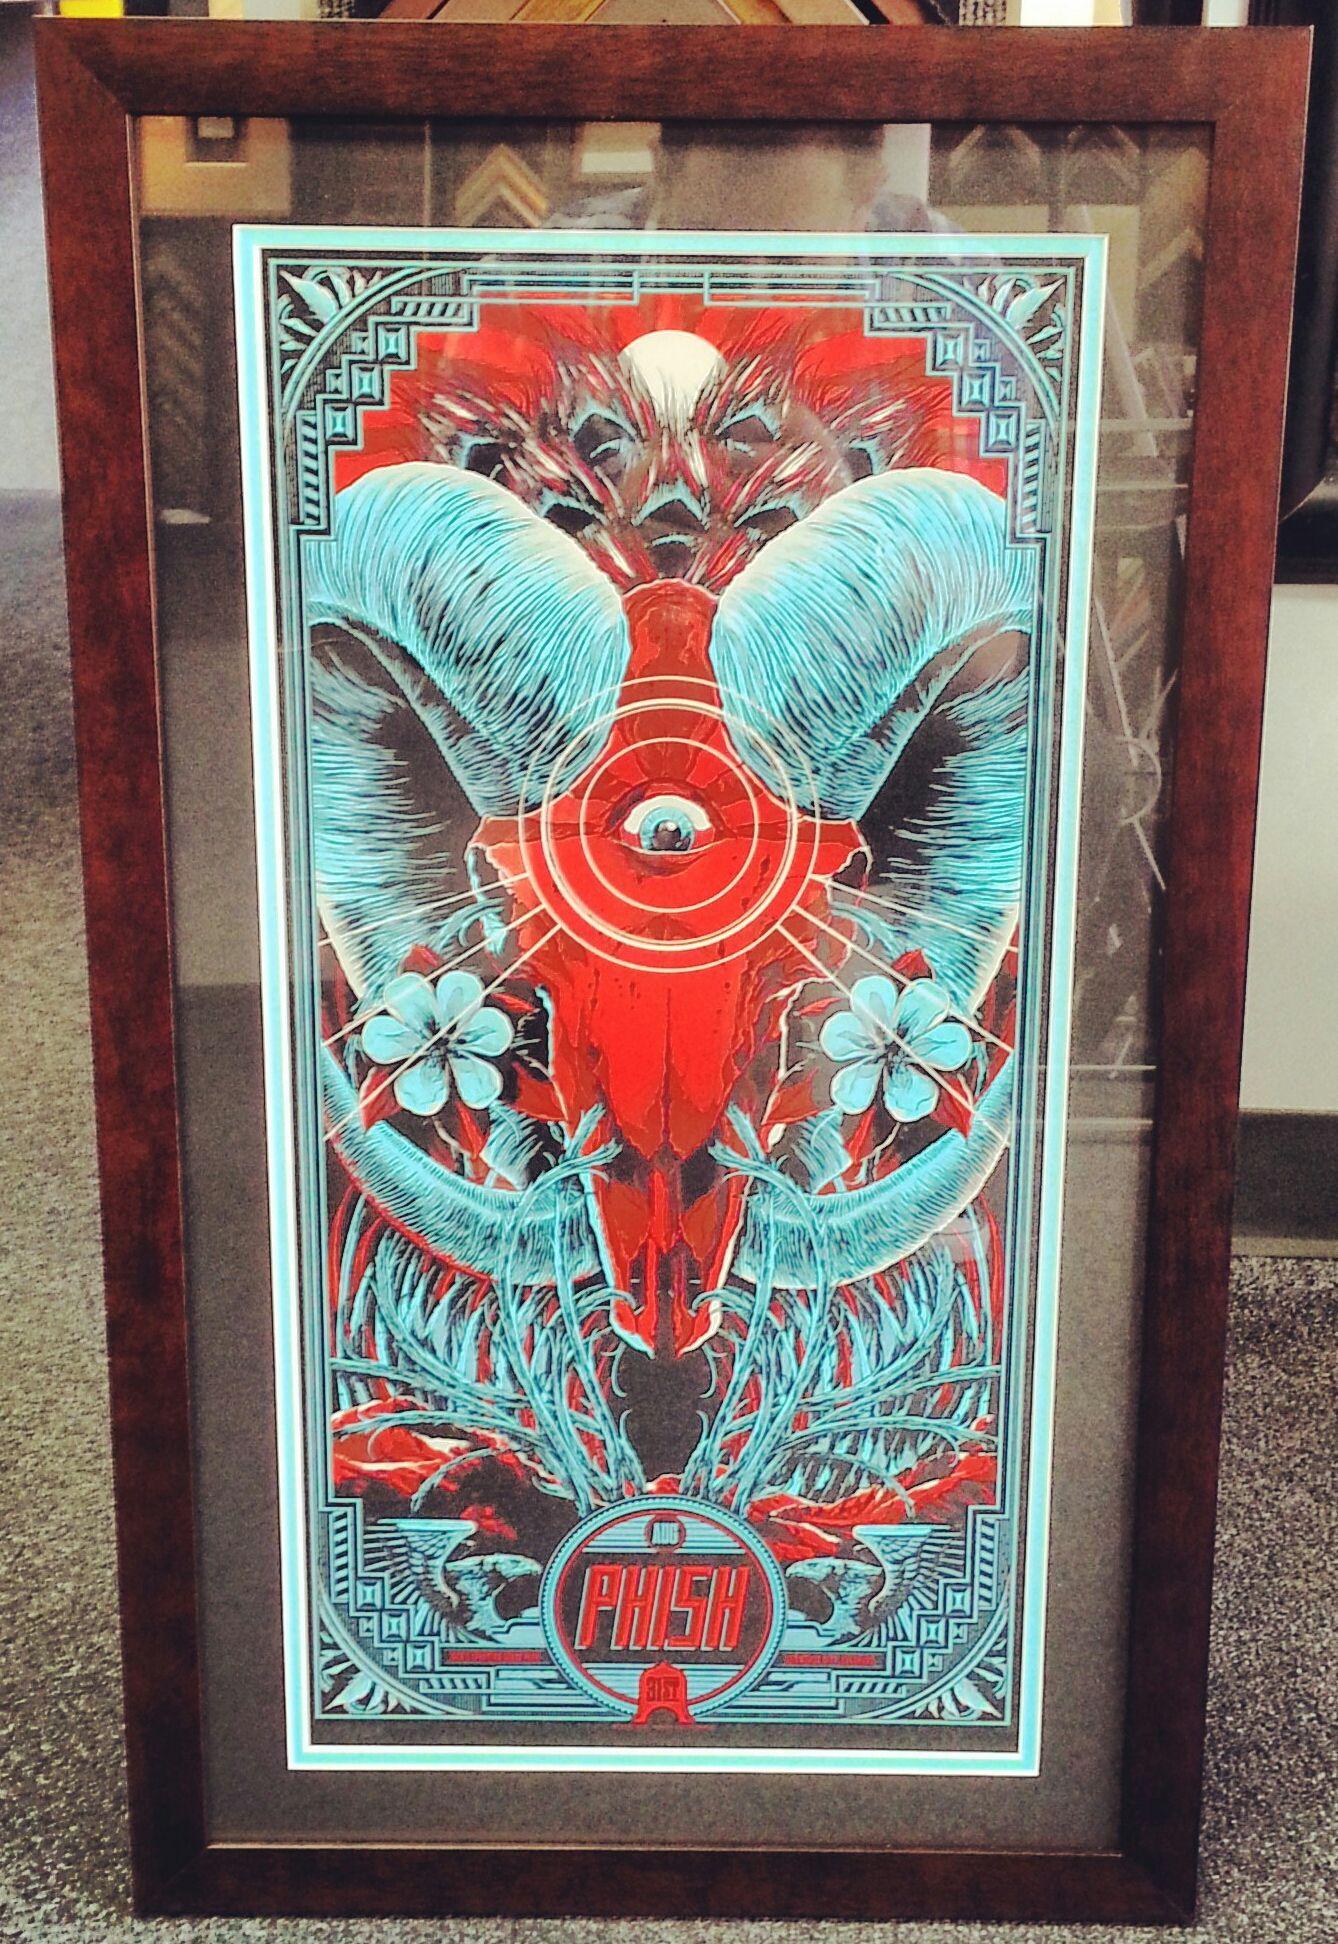 Custom framed Phish poster using black and turquoise acid-free mats ...